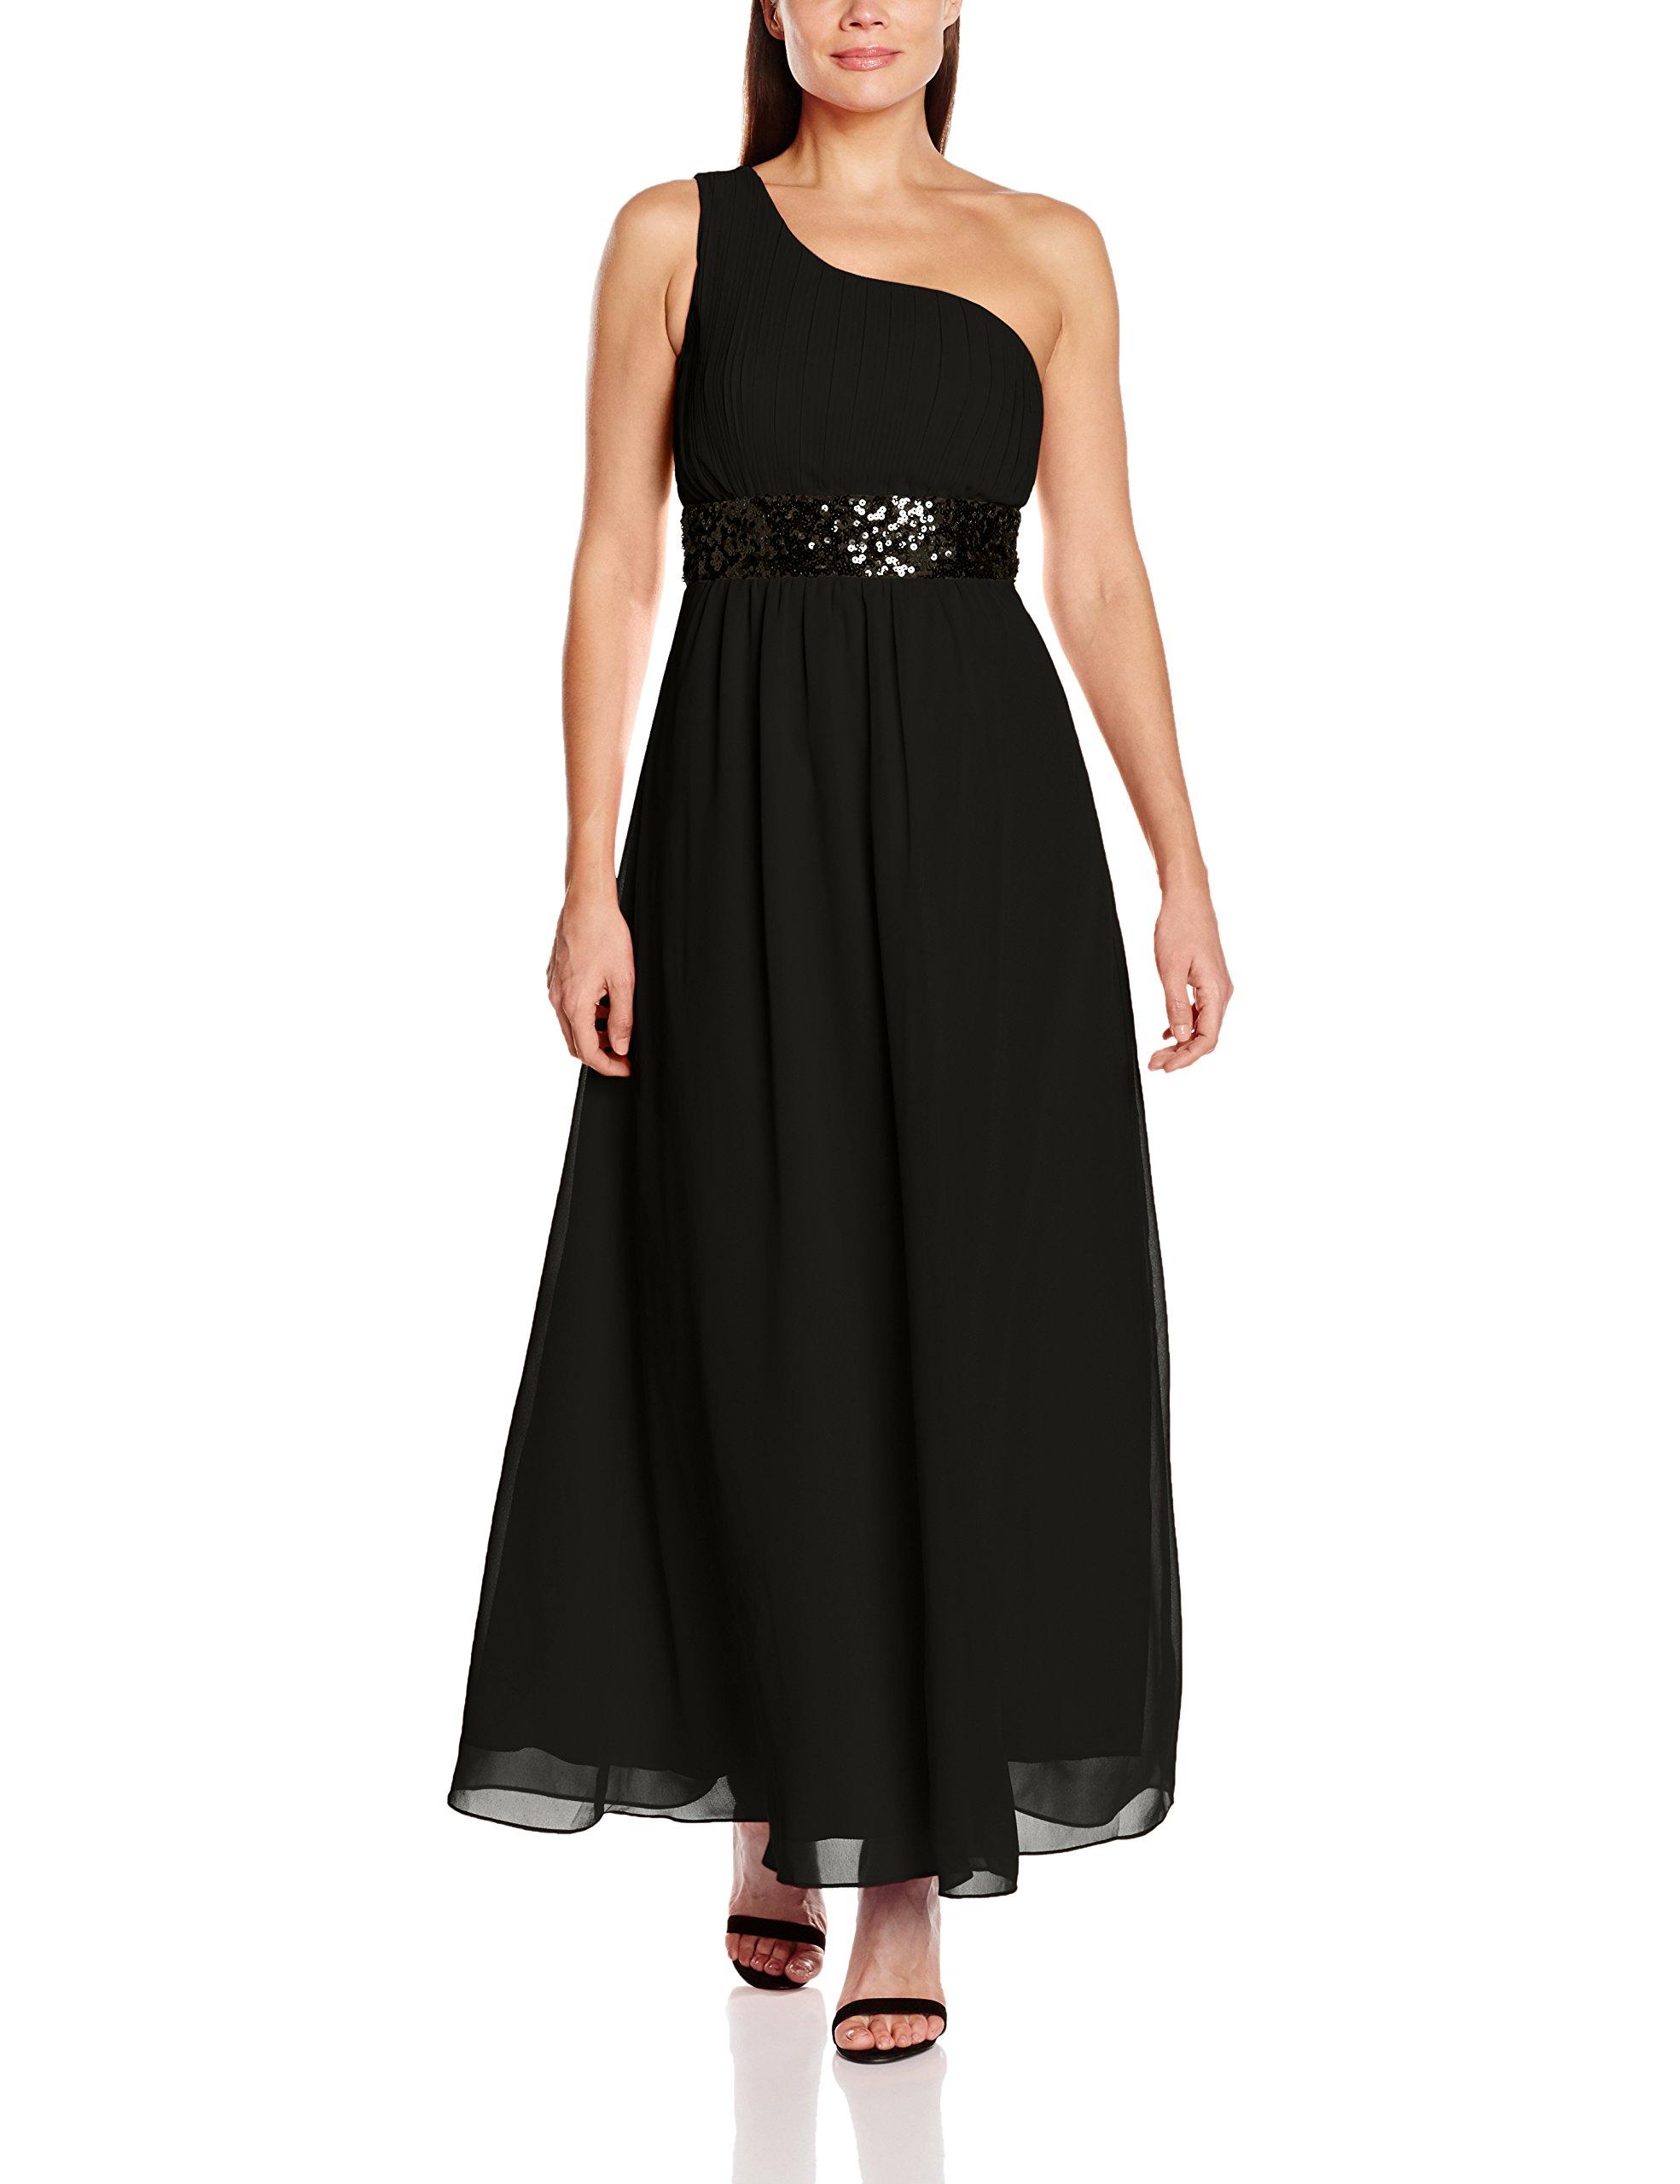 B40 Evening Grace Femme My Dress De Robes Fête soiréeblack UMzqSVp